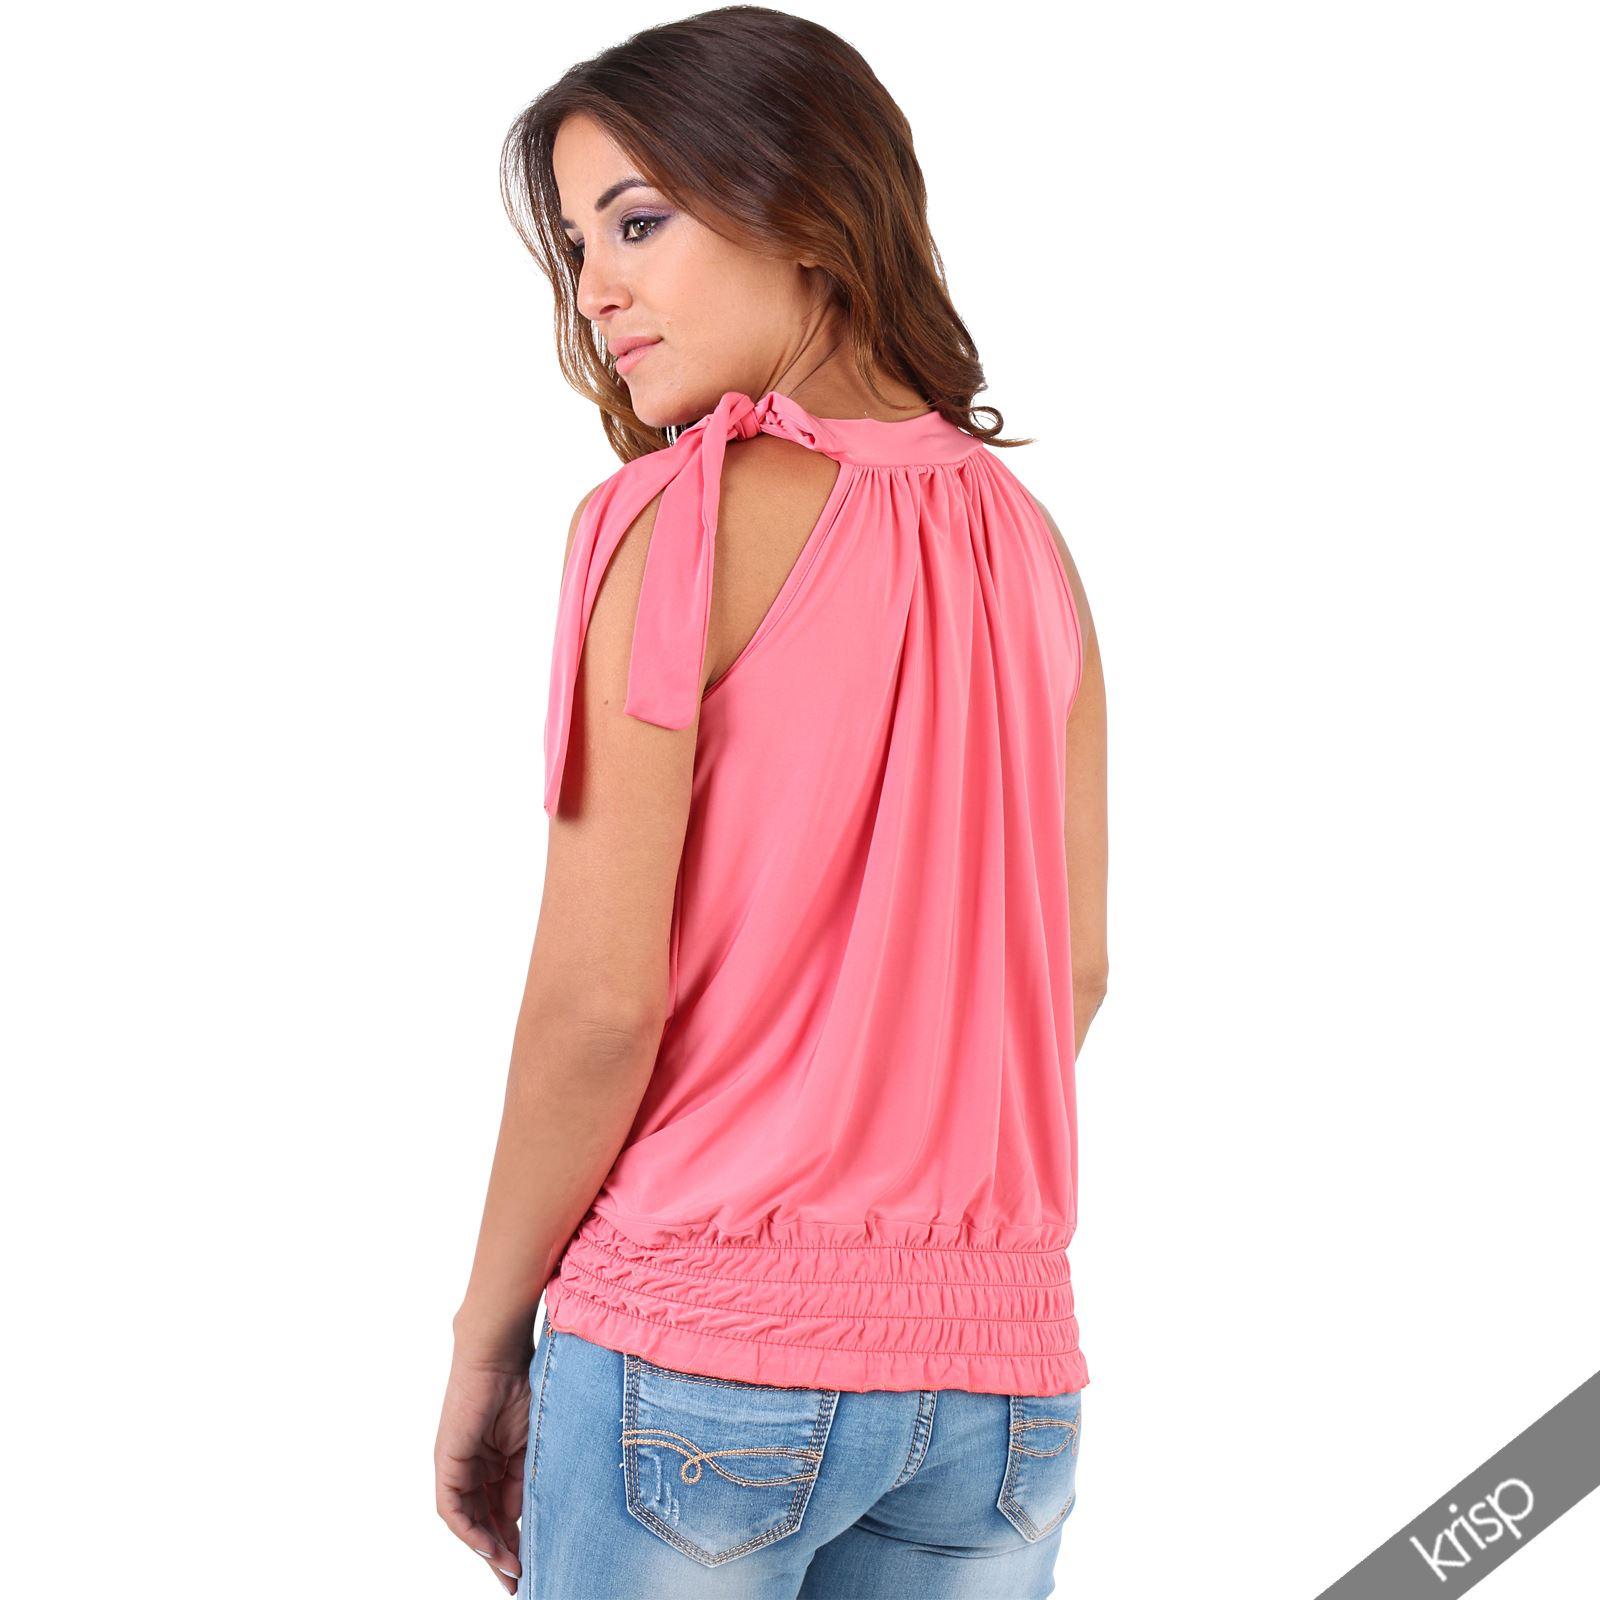 damen neckholder top rmellose bluse mit schleife plissee abendmode party ebay. Black Bedroom Furniture Sets. Home Design Ideas